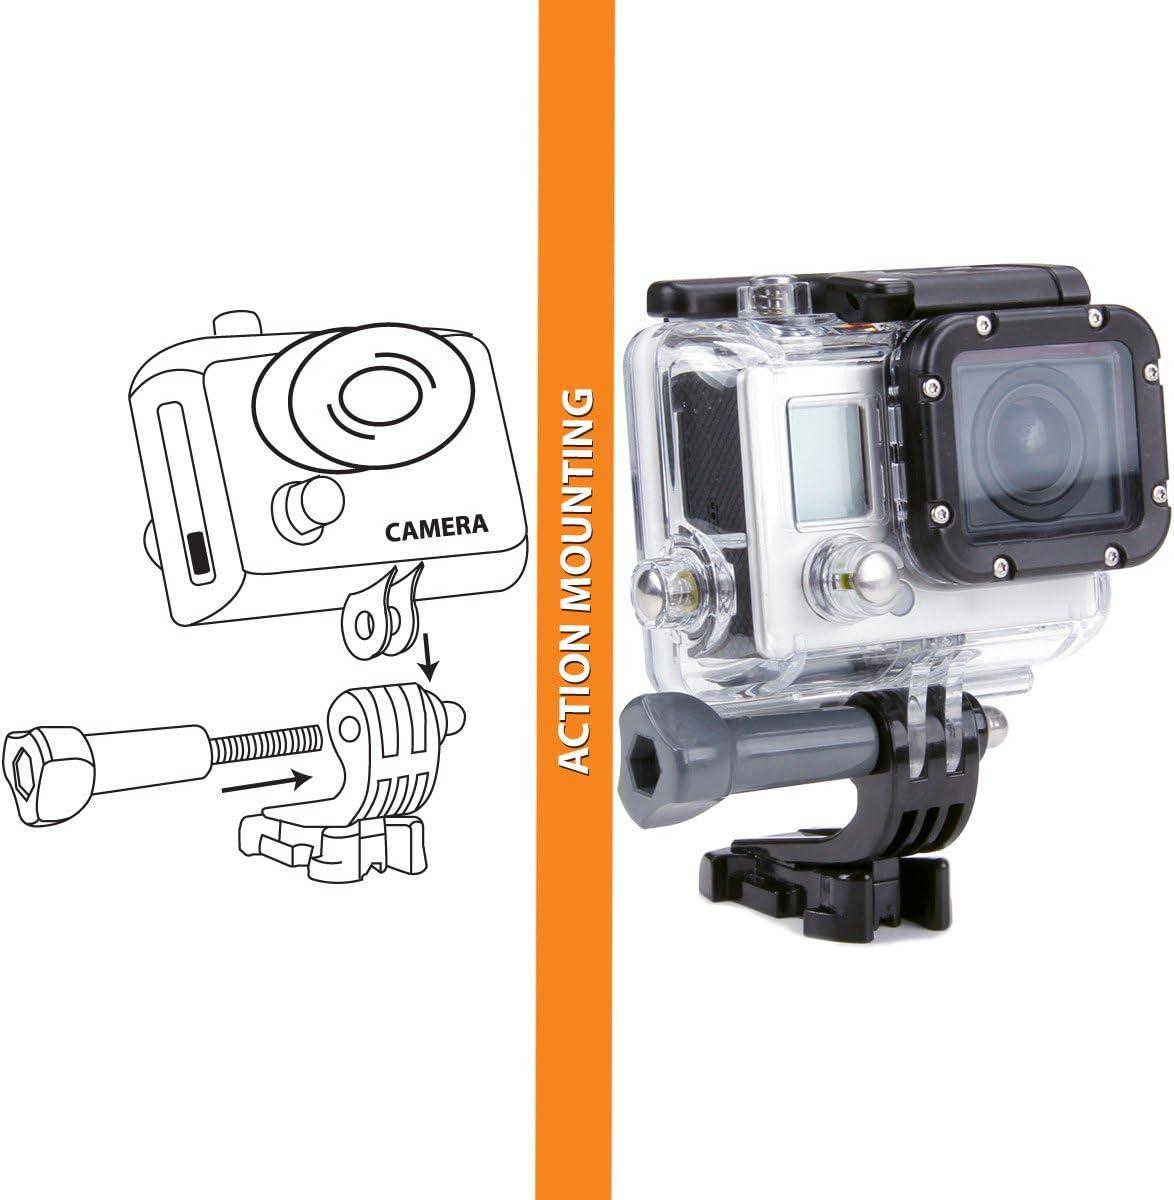 USA Gear Correa para la Cabeza Soporte para cámara de acción GoPro ...